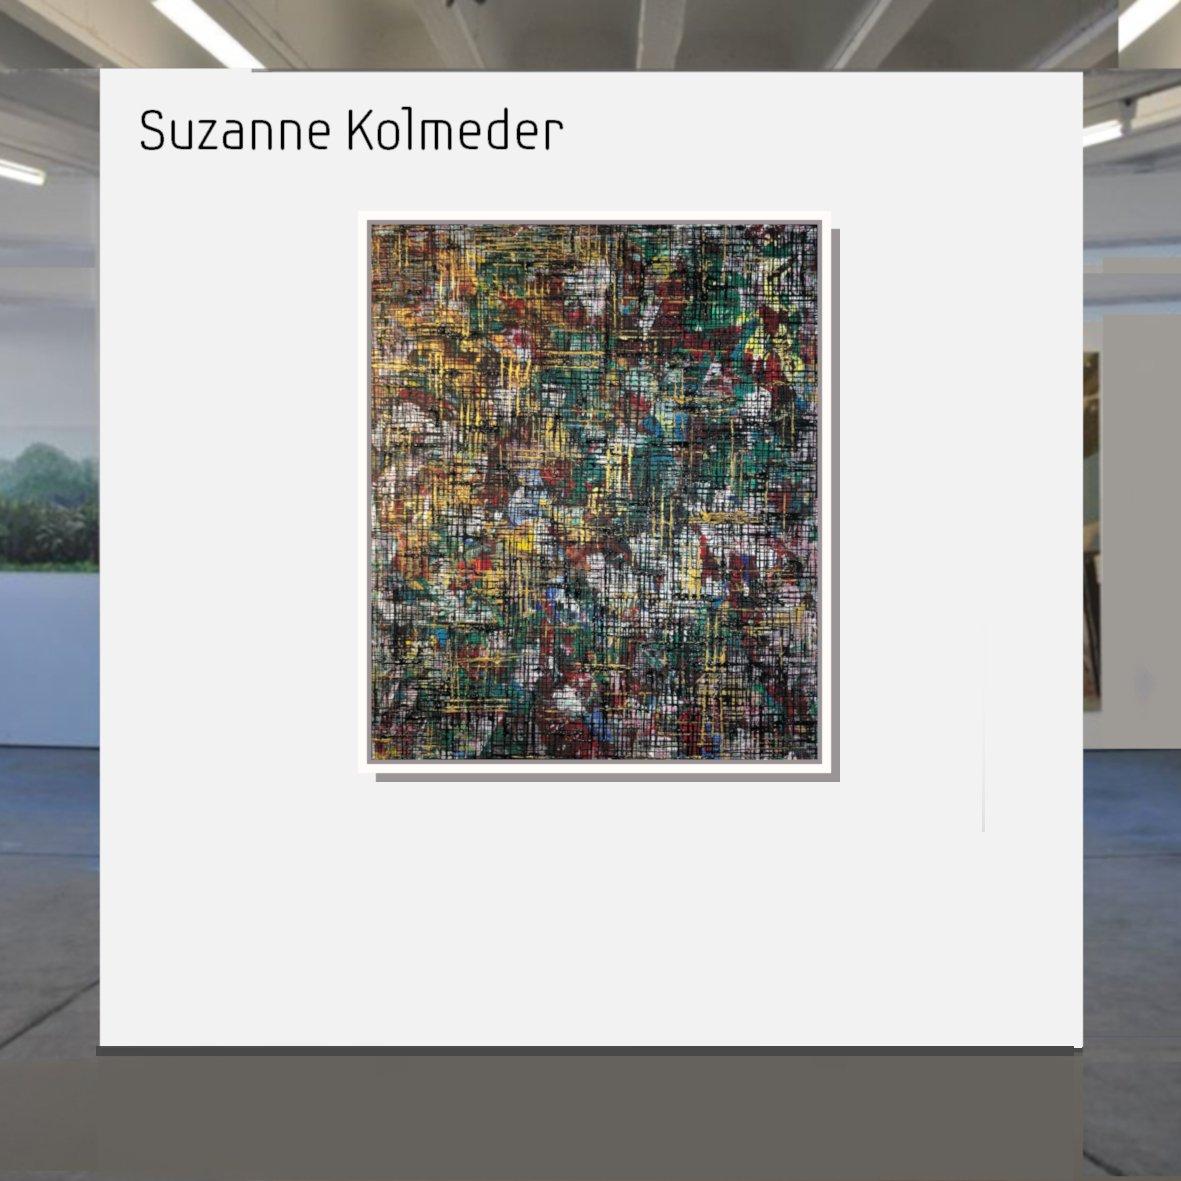 Maske_Suzanne_Kolmeder_Deep_Networks._Matrix_No_23